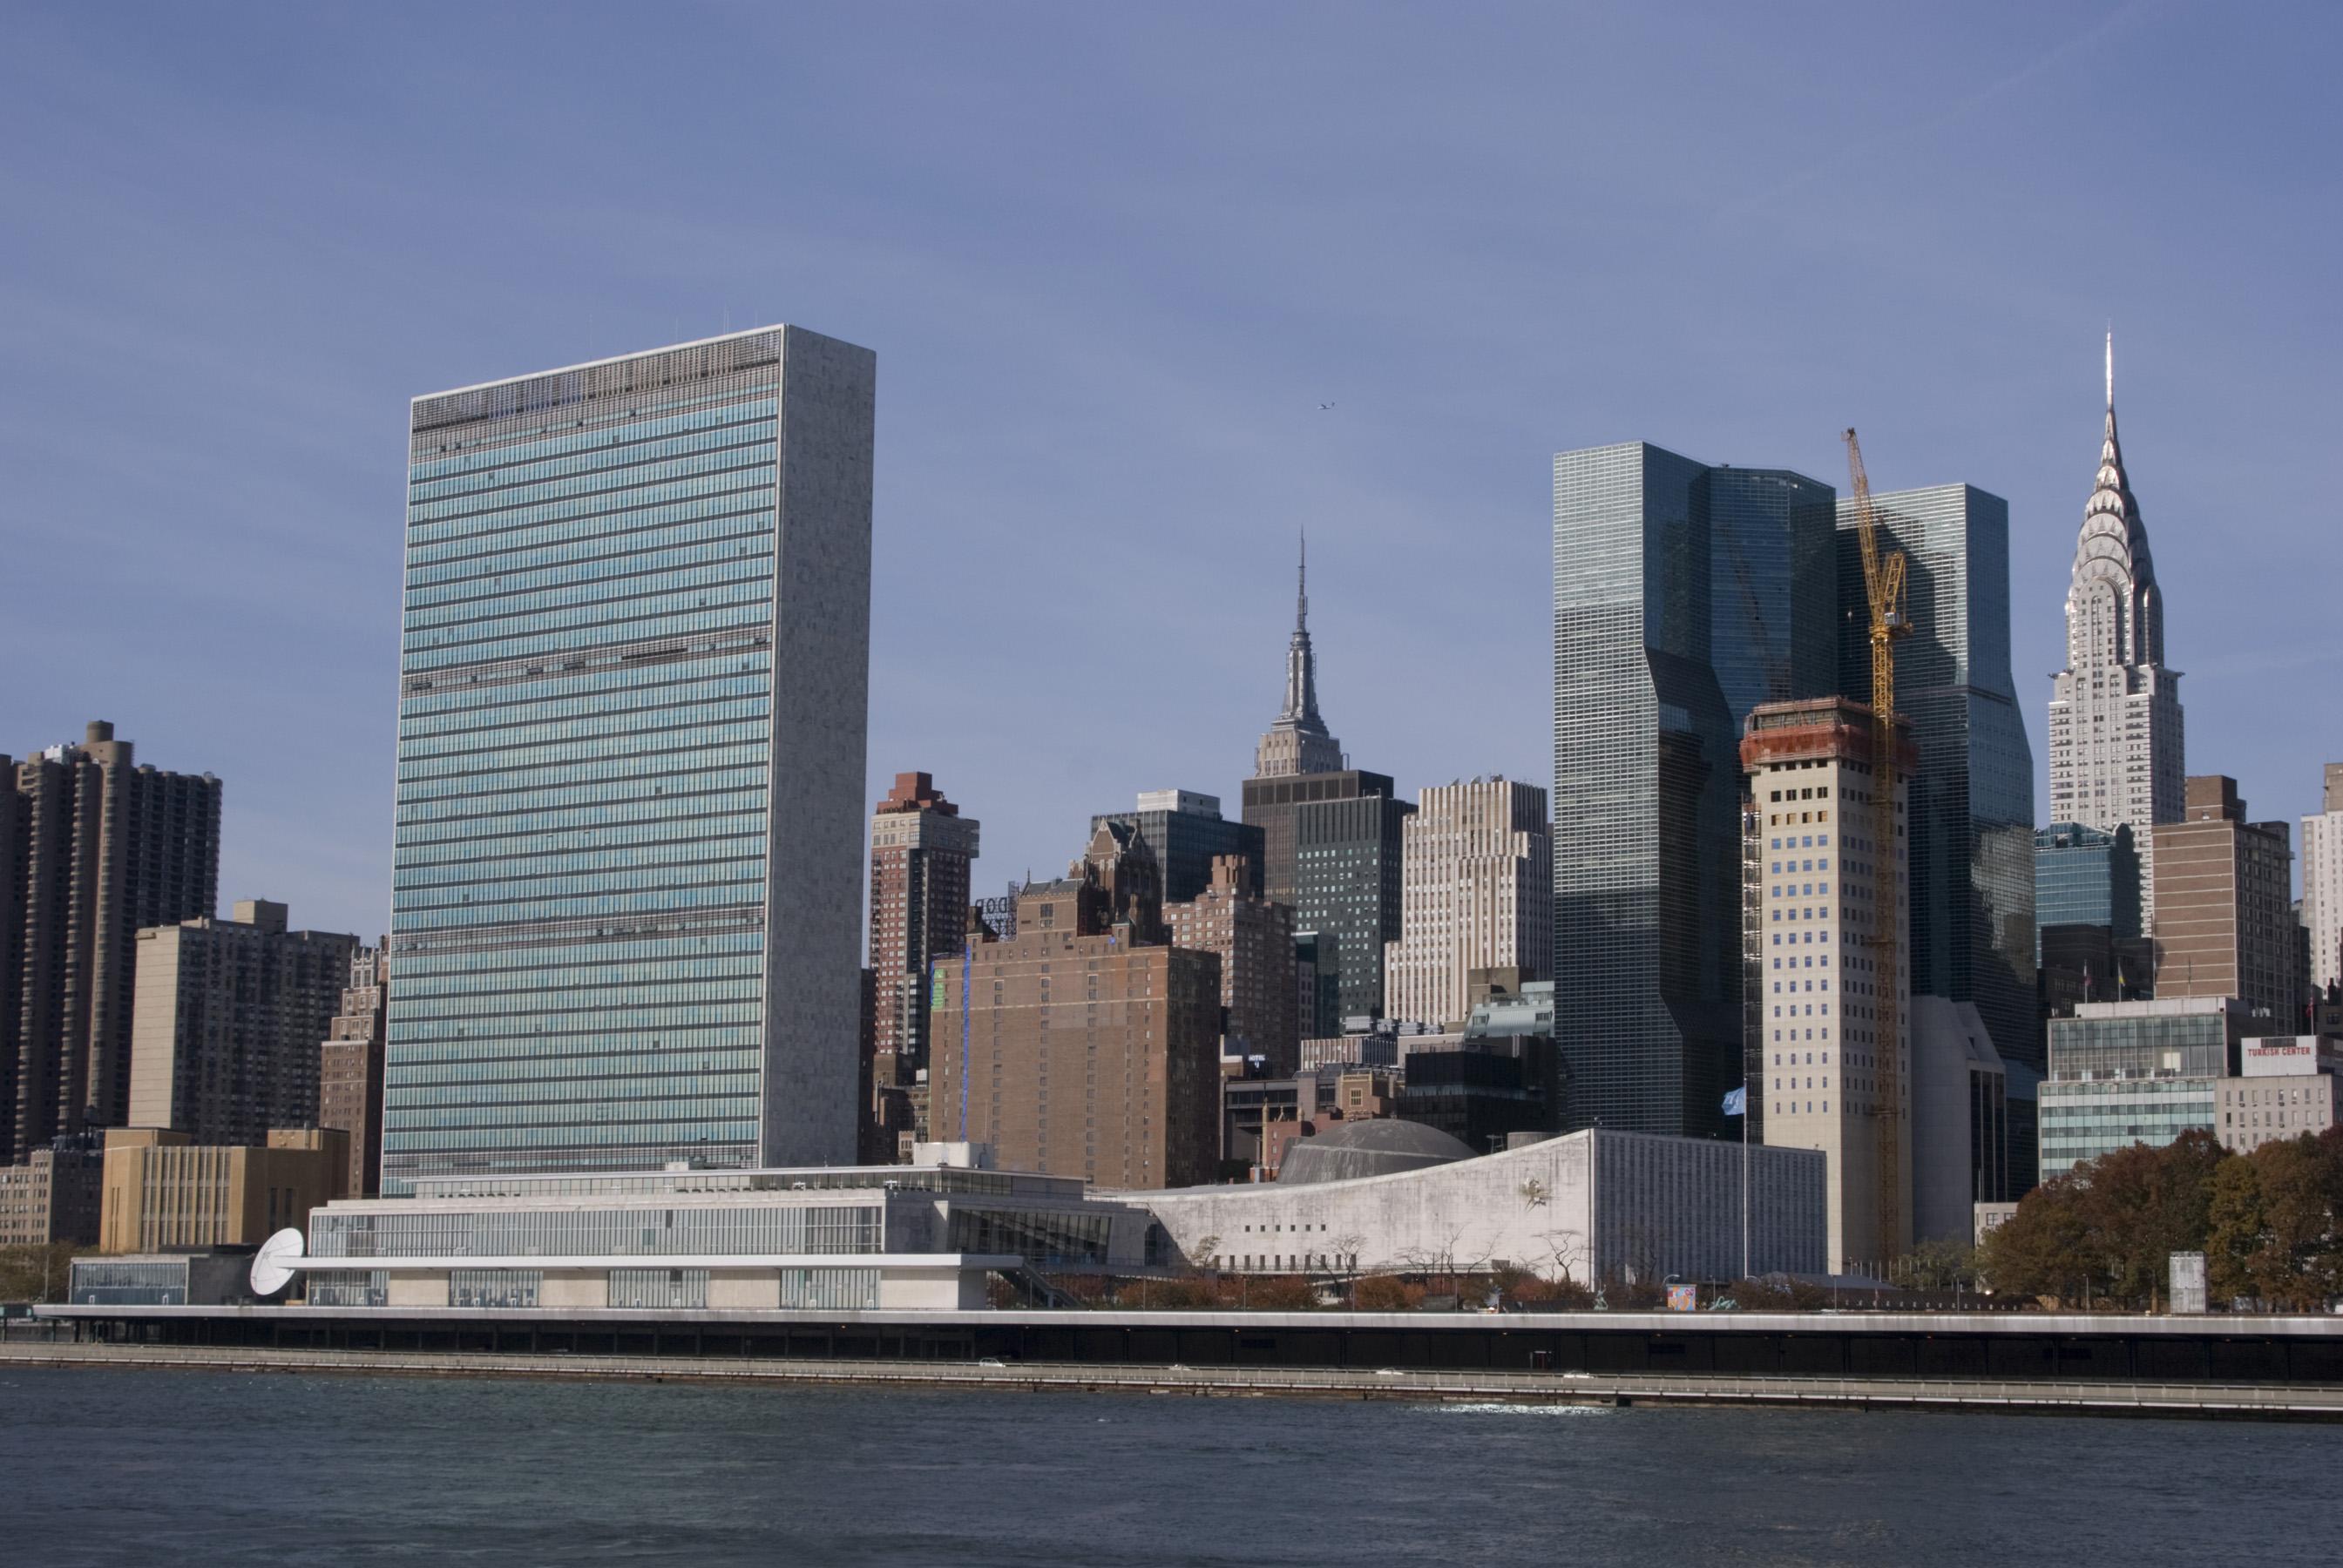 New York (Photo: www.humanrightsvoices.org)